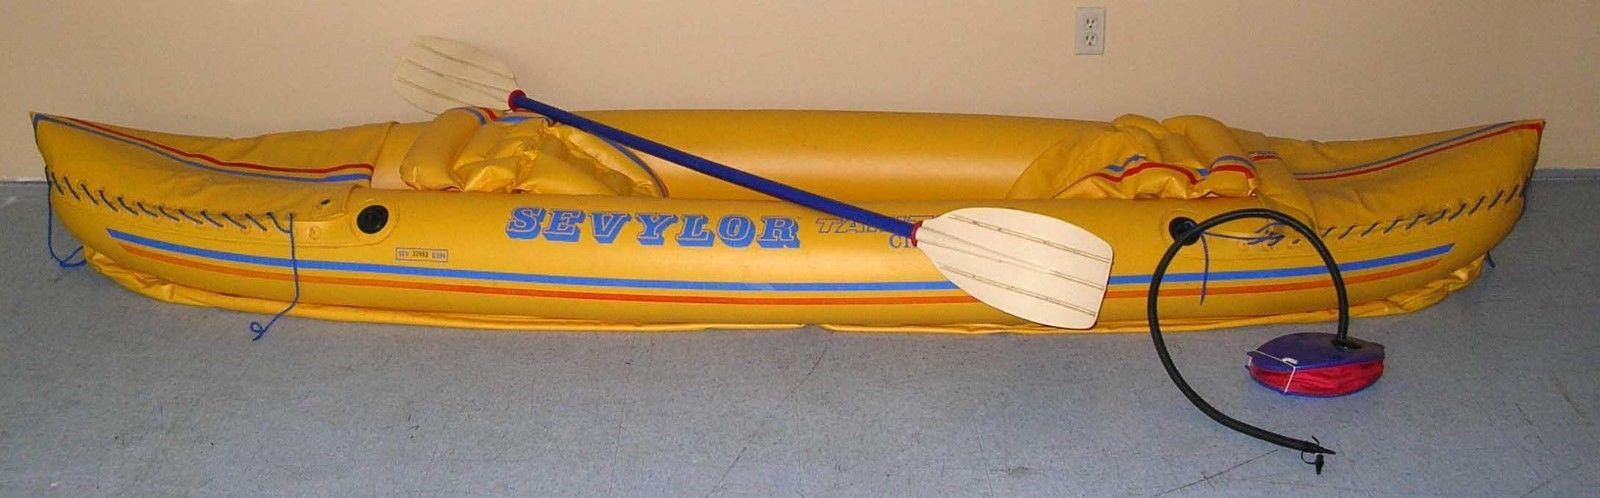 SEVYLOR 10 FOOT CANOE / KAYAK